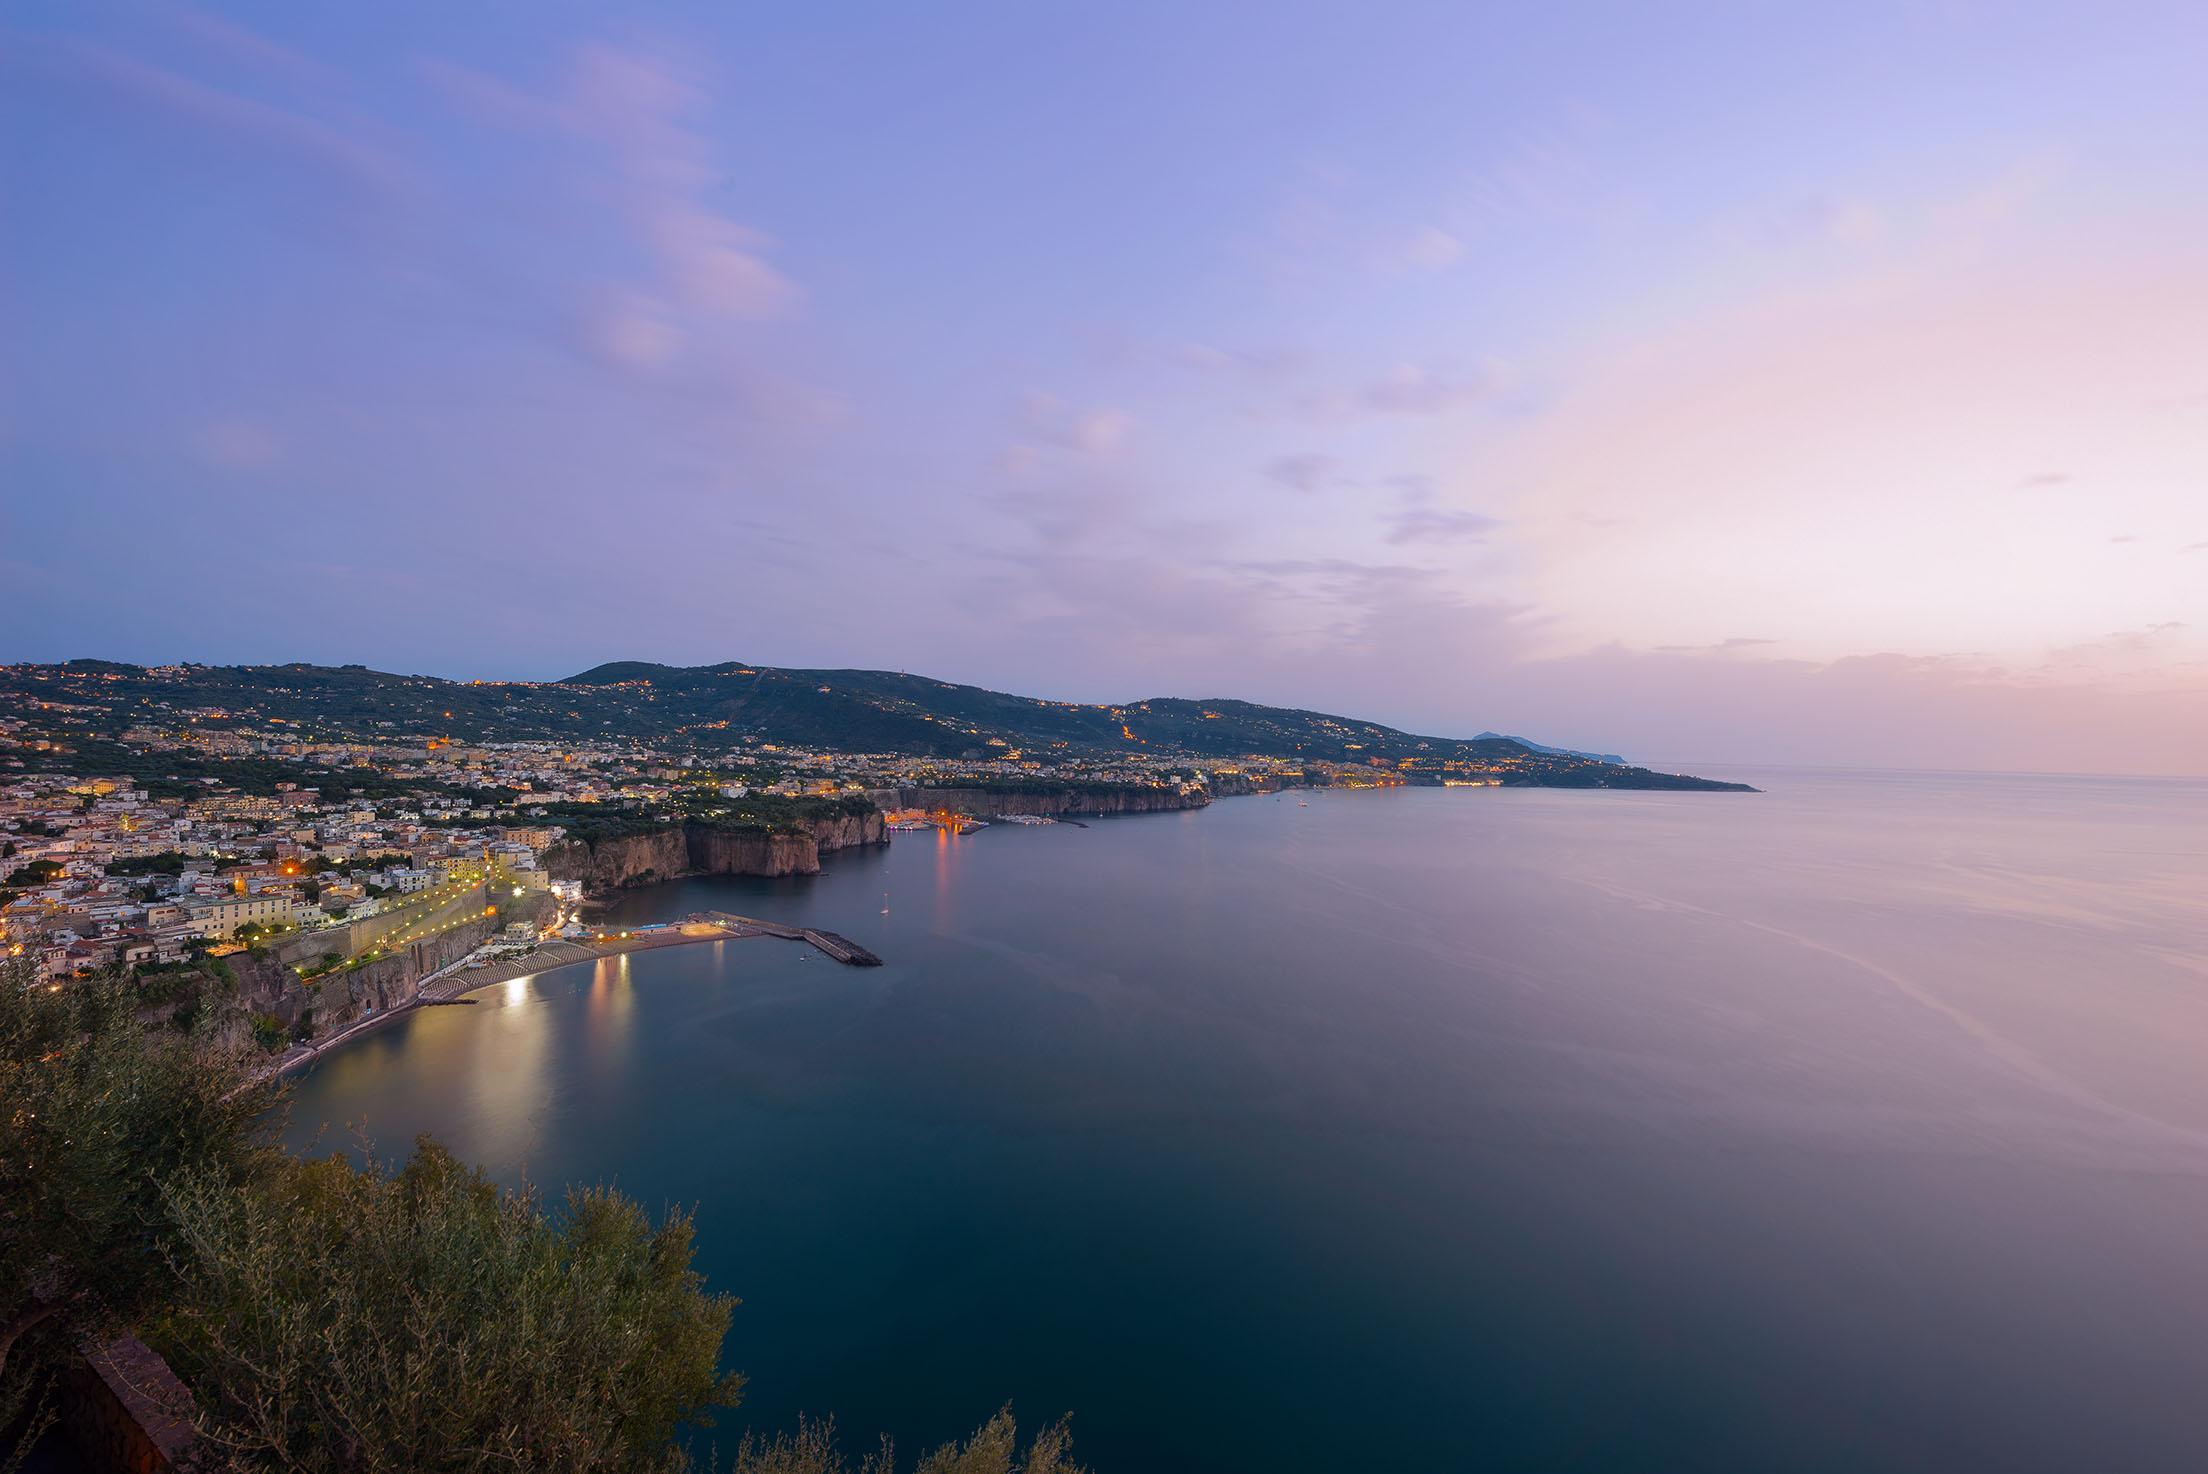 Giuseppe Sapori - Coastal Prism